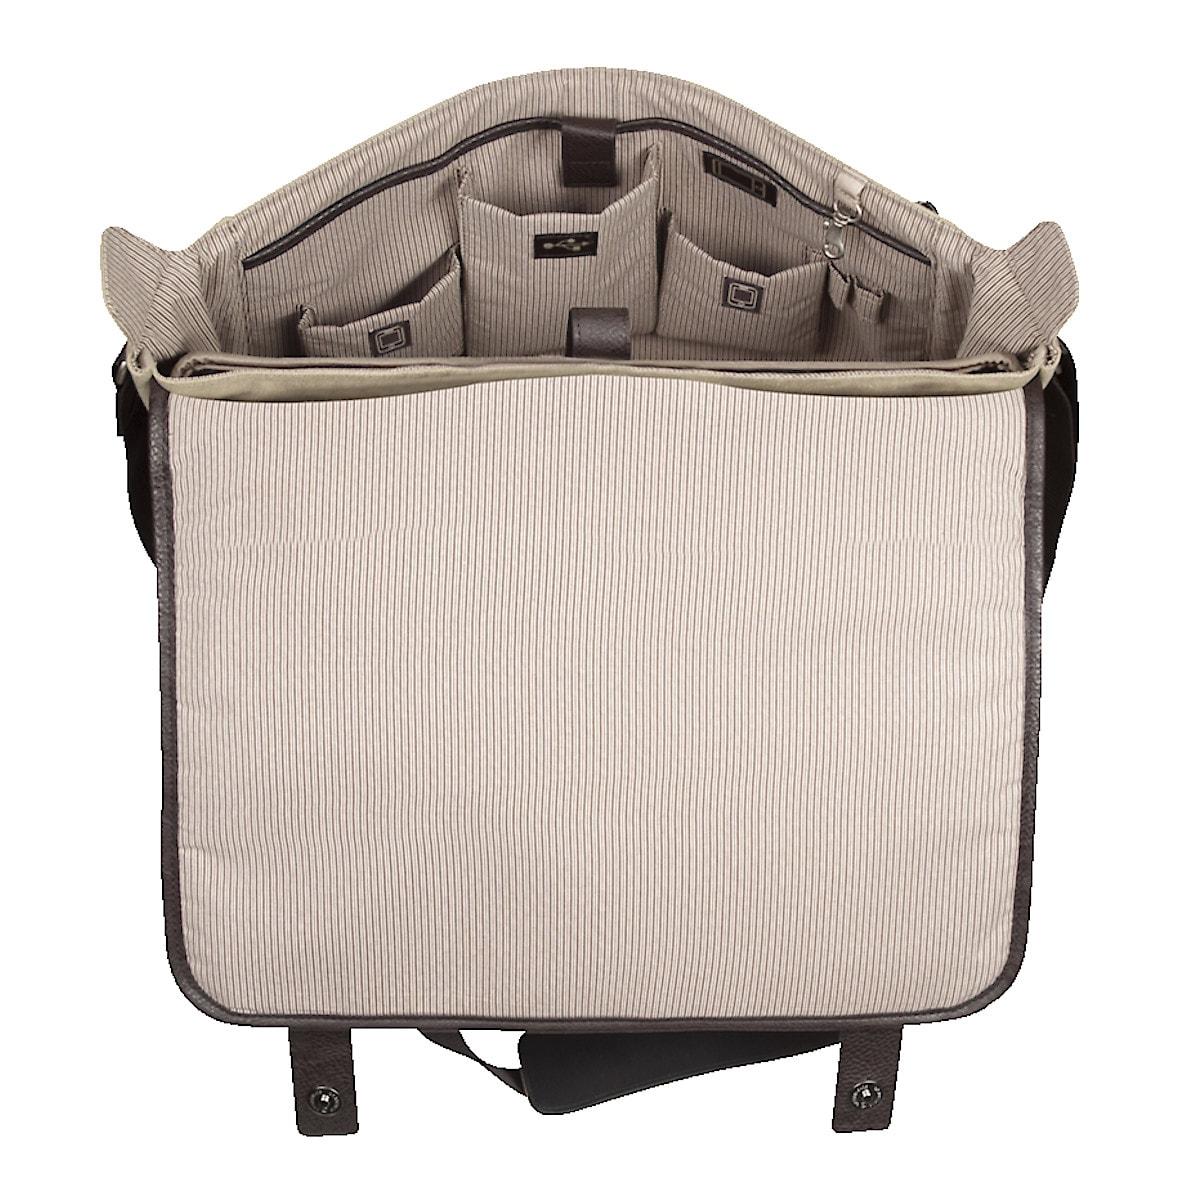 Laptop-laukku 15,6